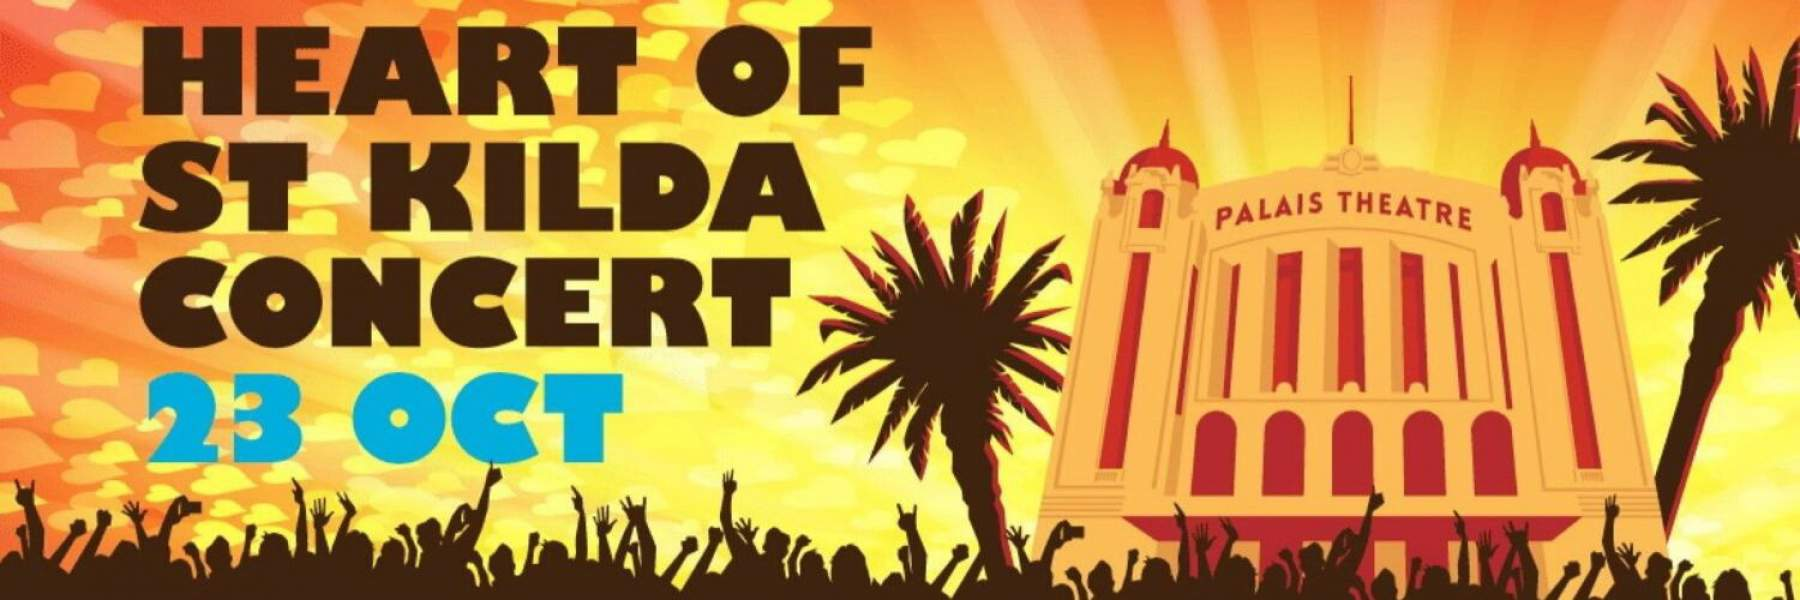 Heart of St Kilda Concert